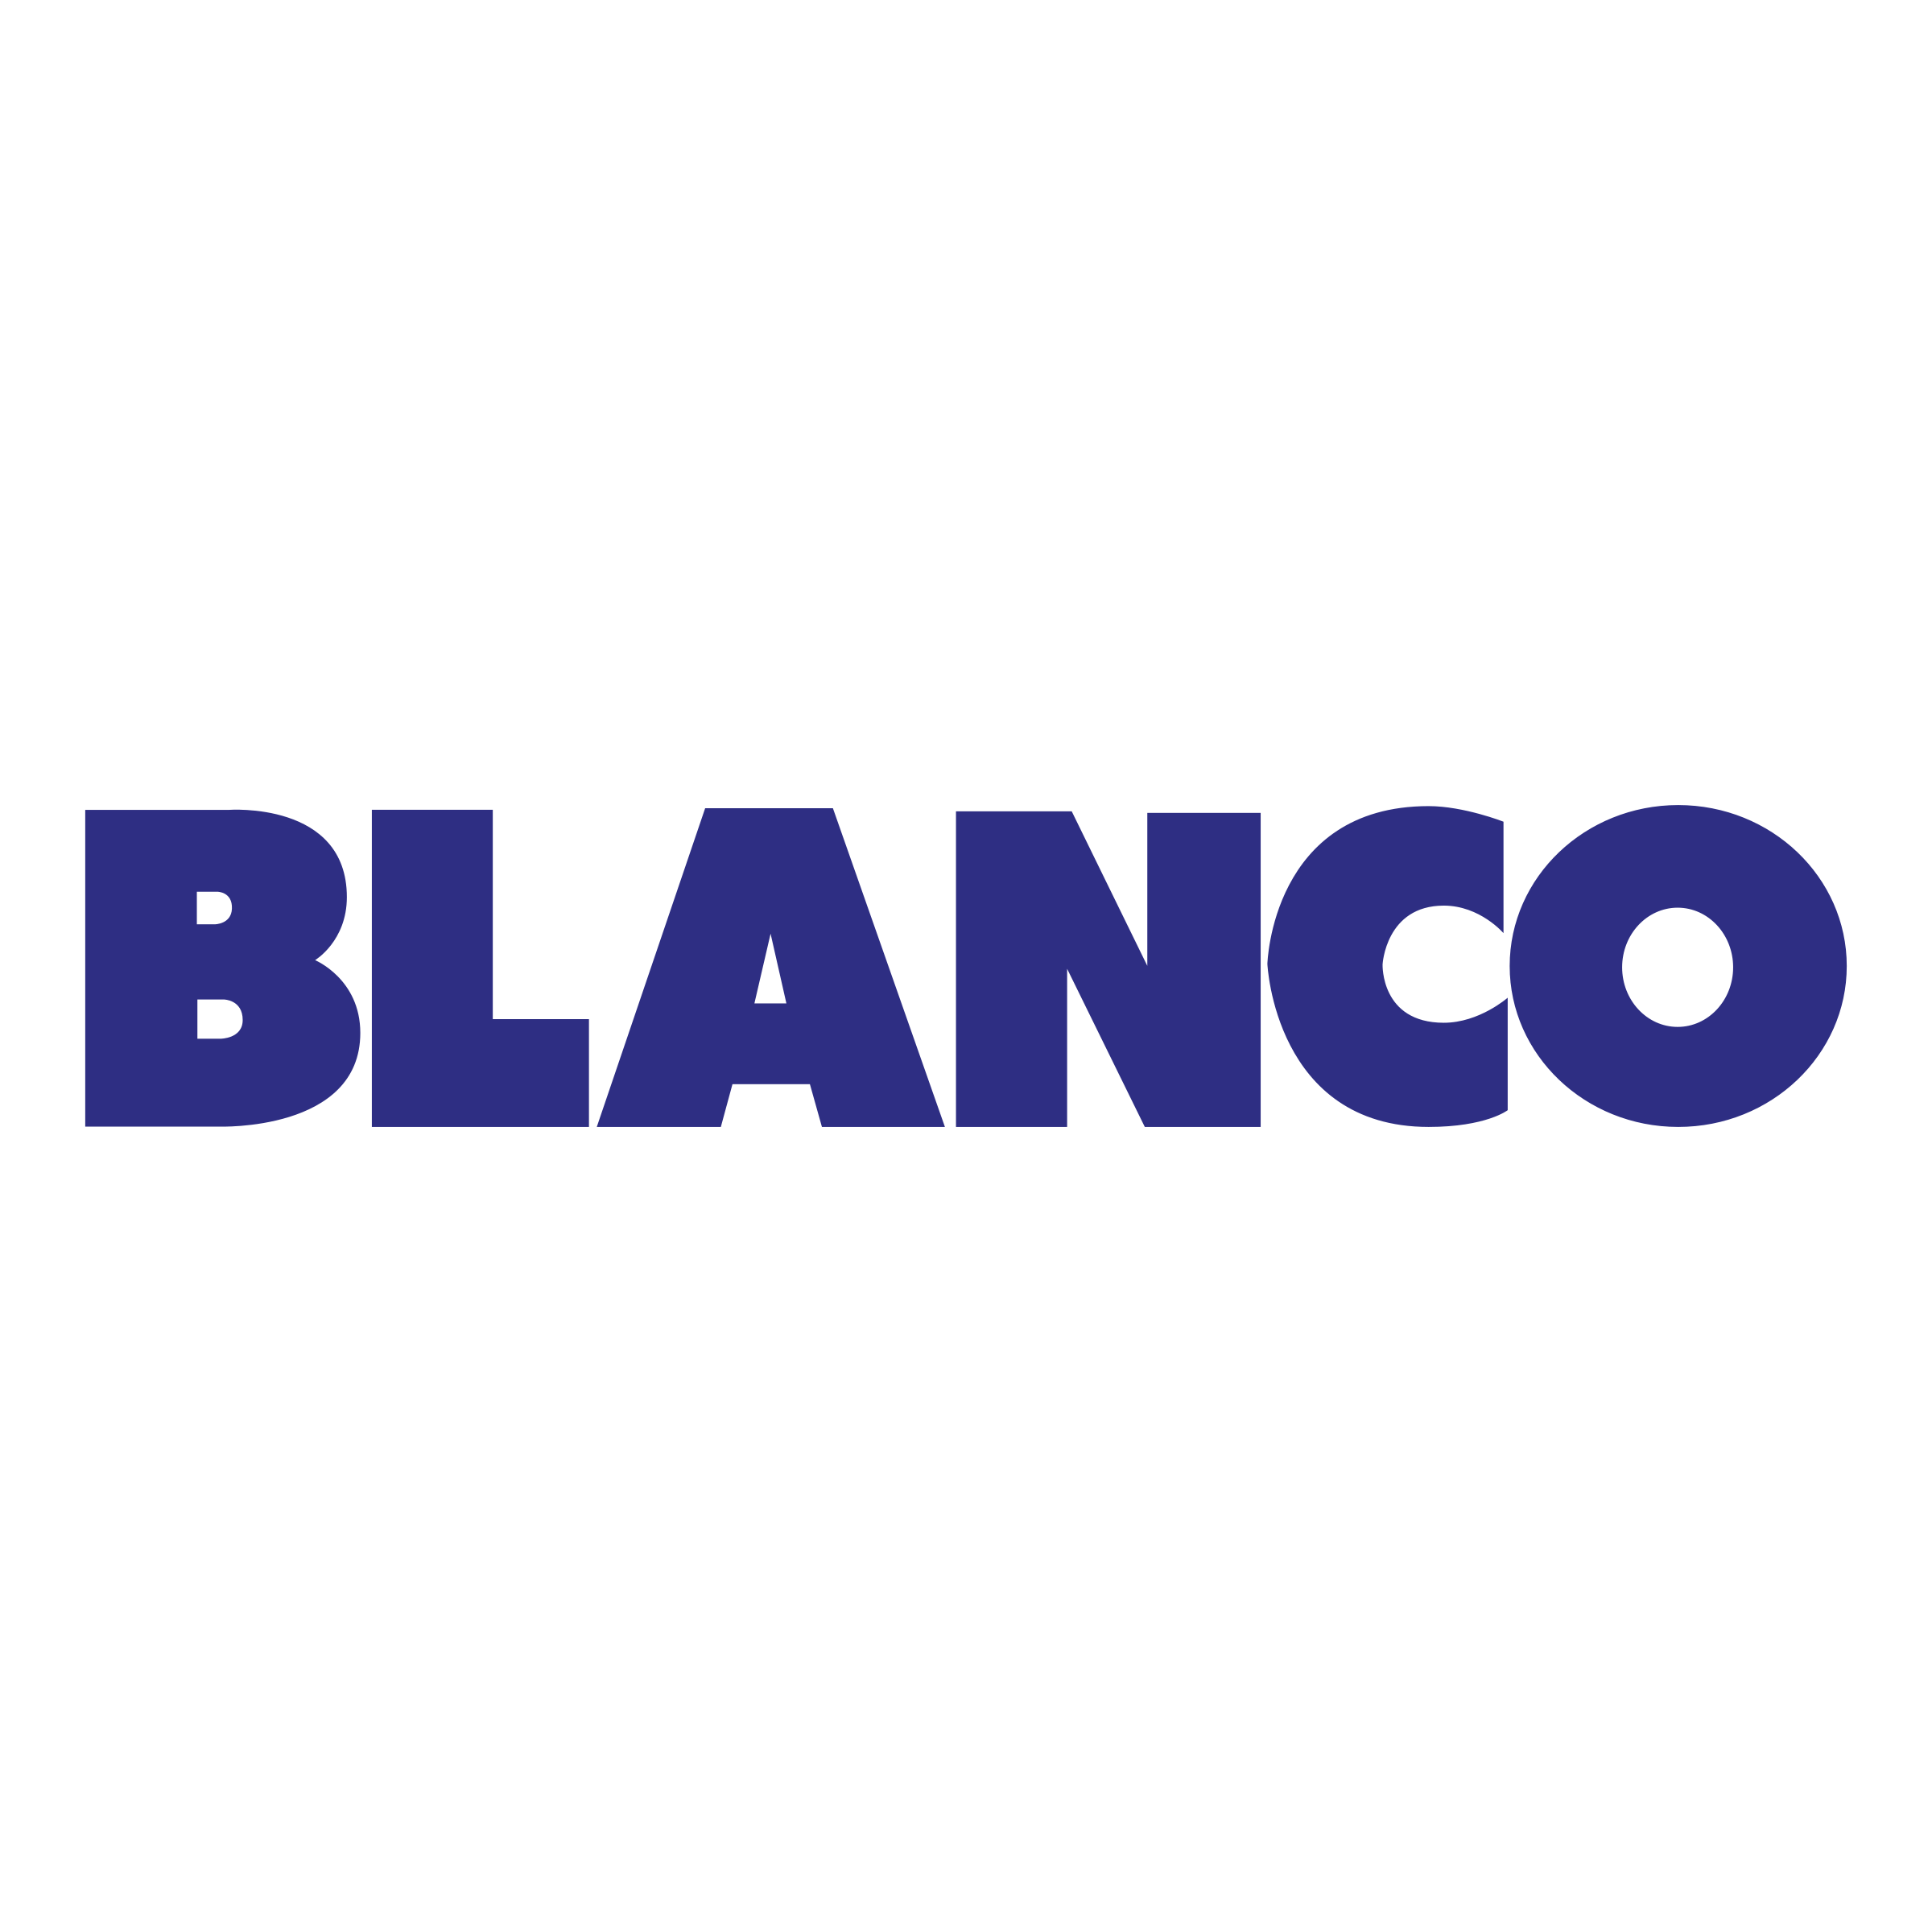 blanco-logo-png-transparent.png